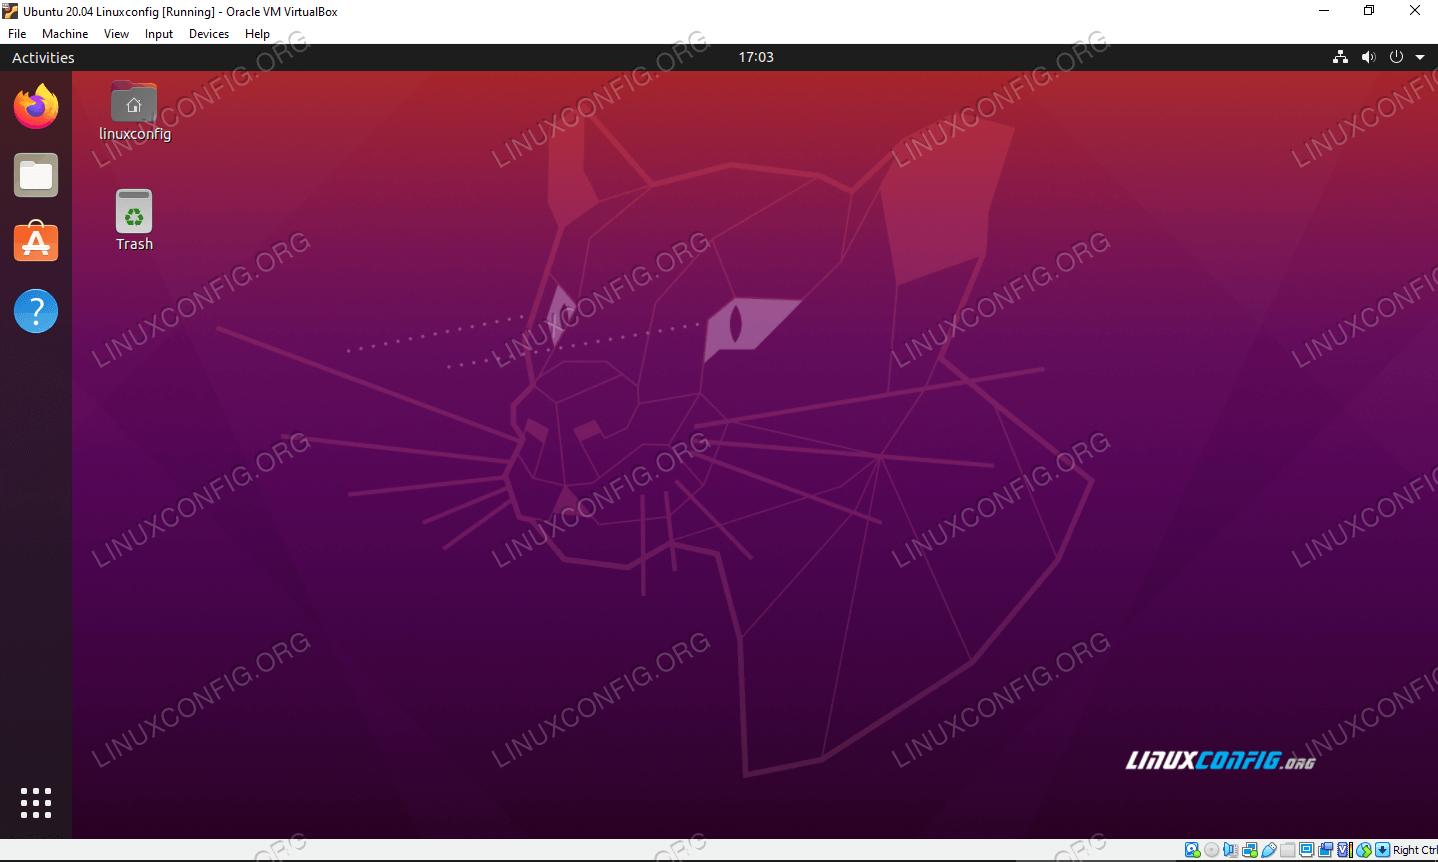 Ubuntu 20.04 Focal Fossa running on a virtual machine in VirtualBox